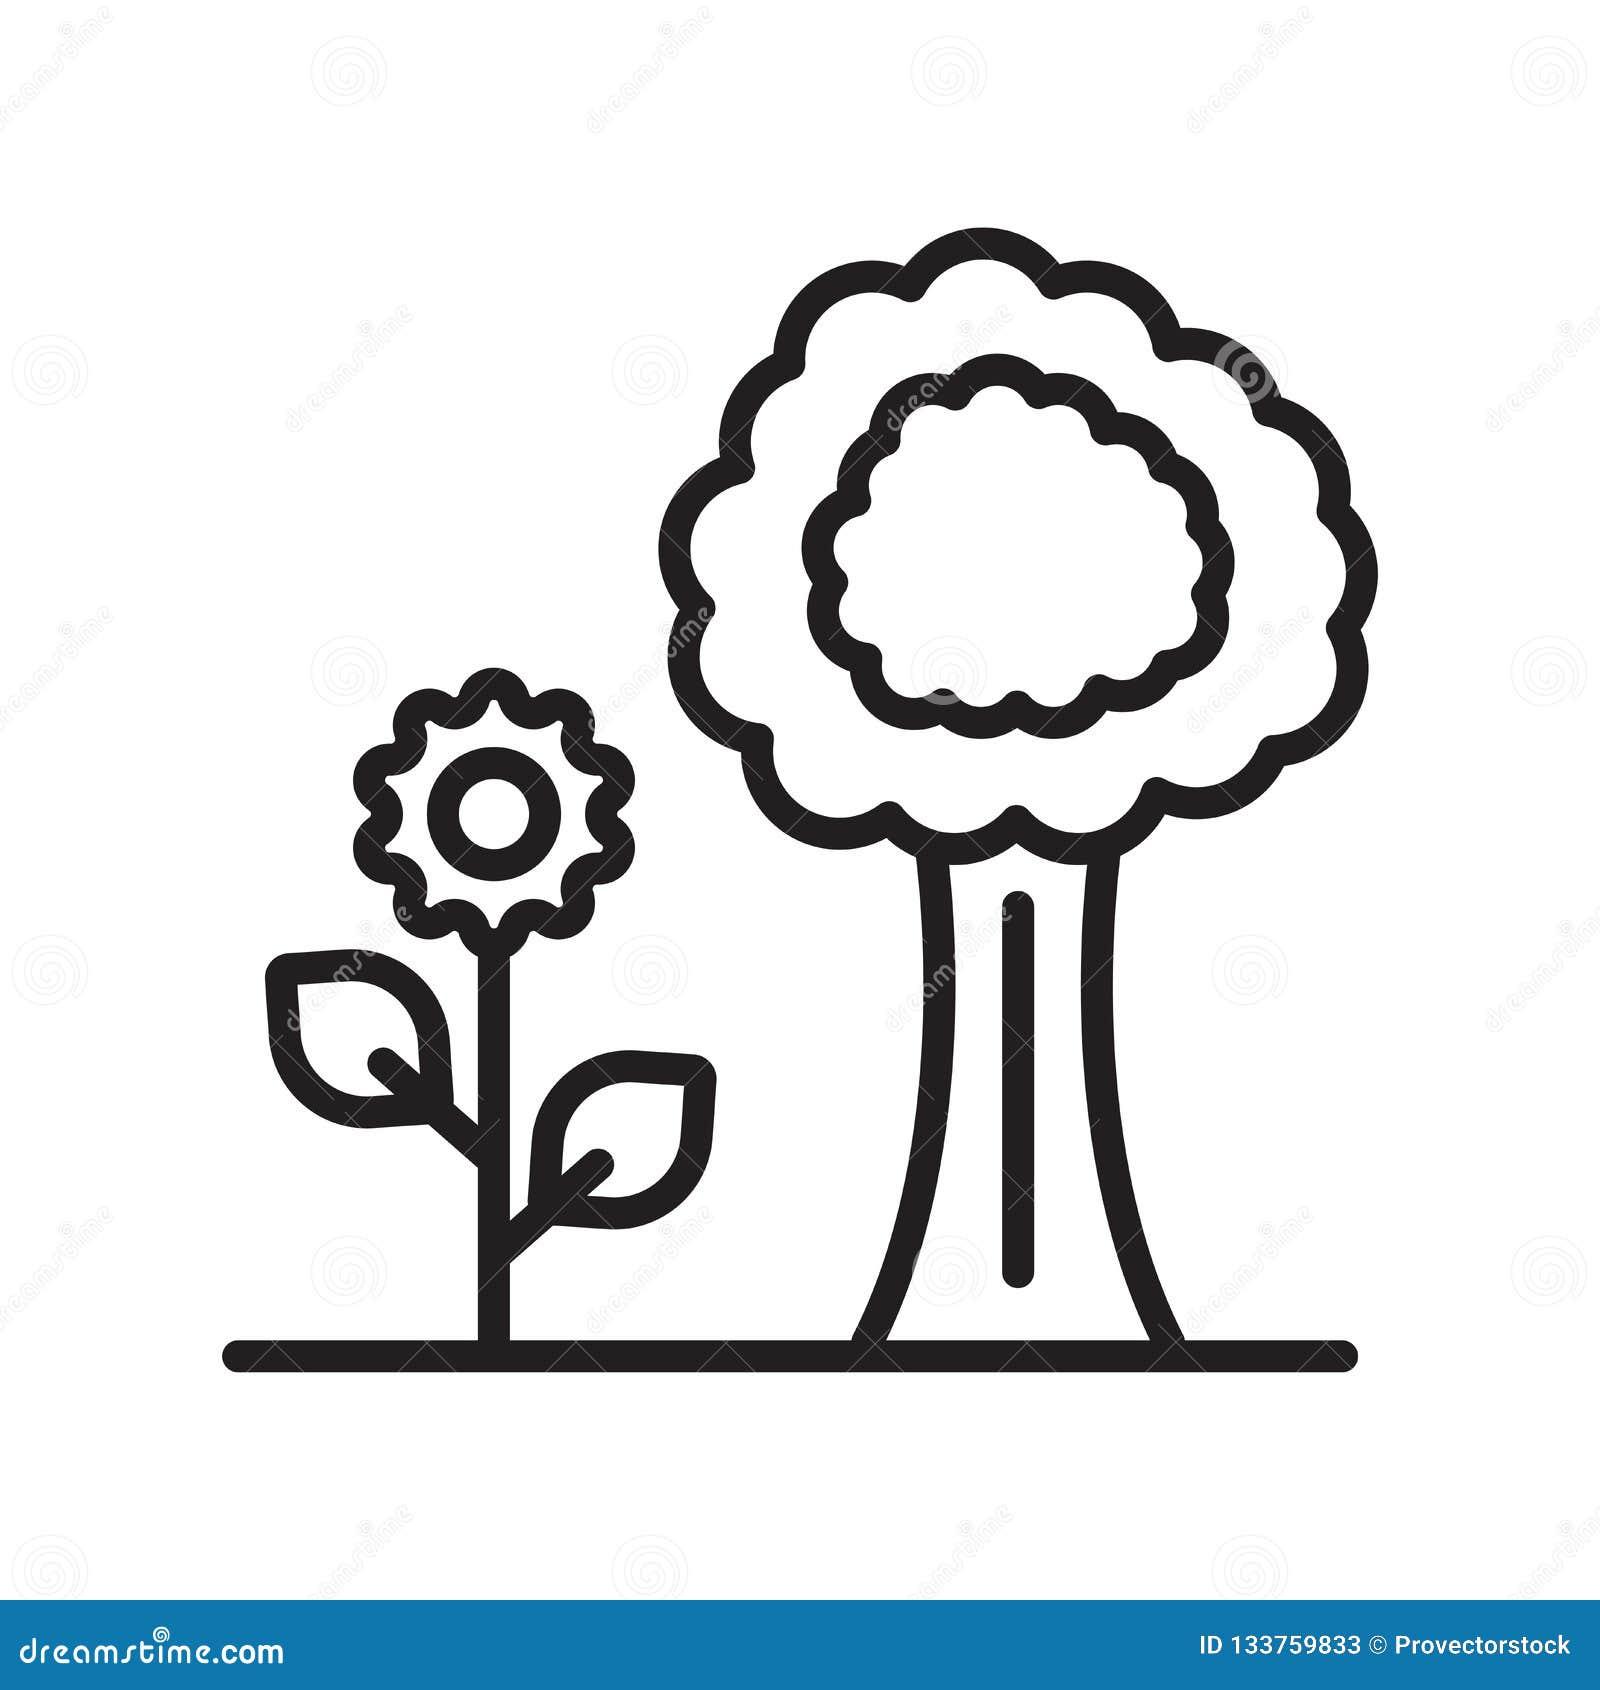 Garden icon vector sign and symbol isolated on white background, Garden logo concept